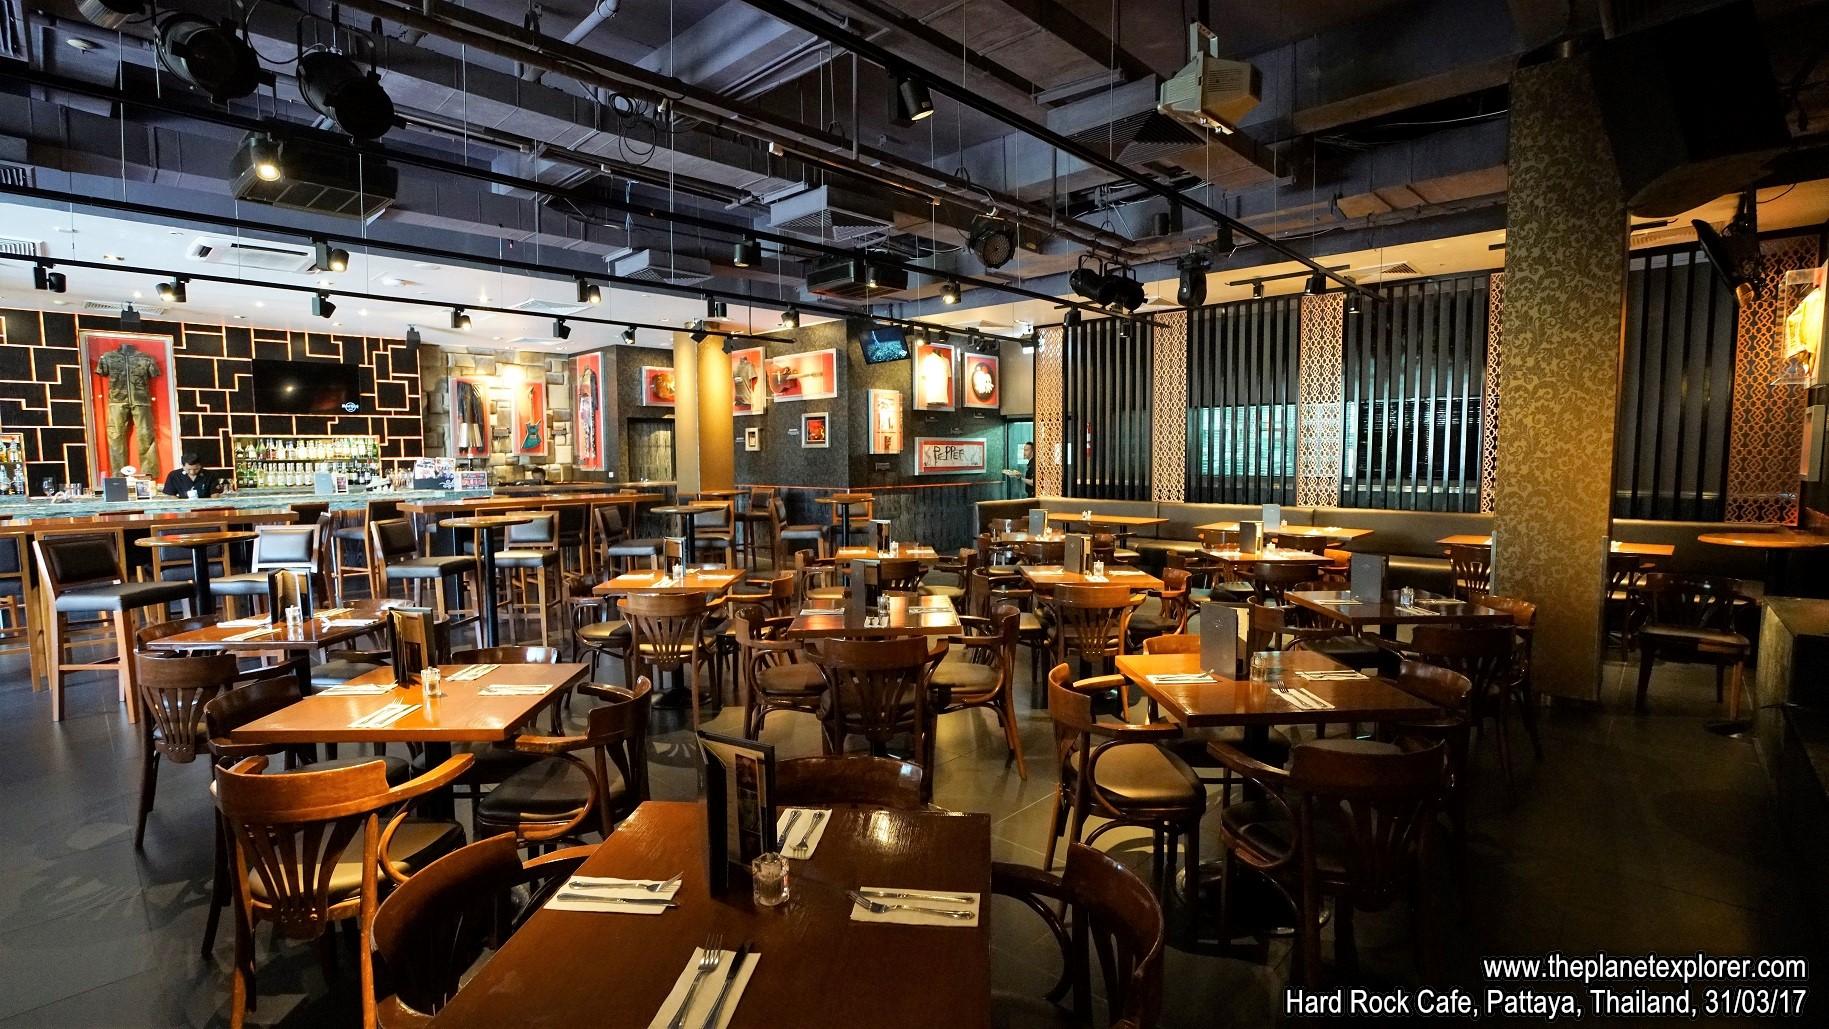 2017-03-31_1441_Thailand_Pattaya_Hard Rock Cafe Pattaya_DSC03916_s7R2_LR_@